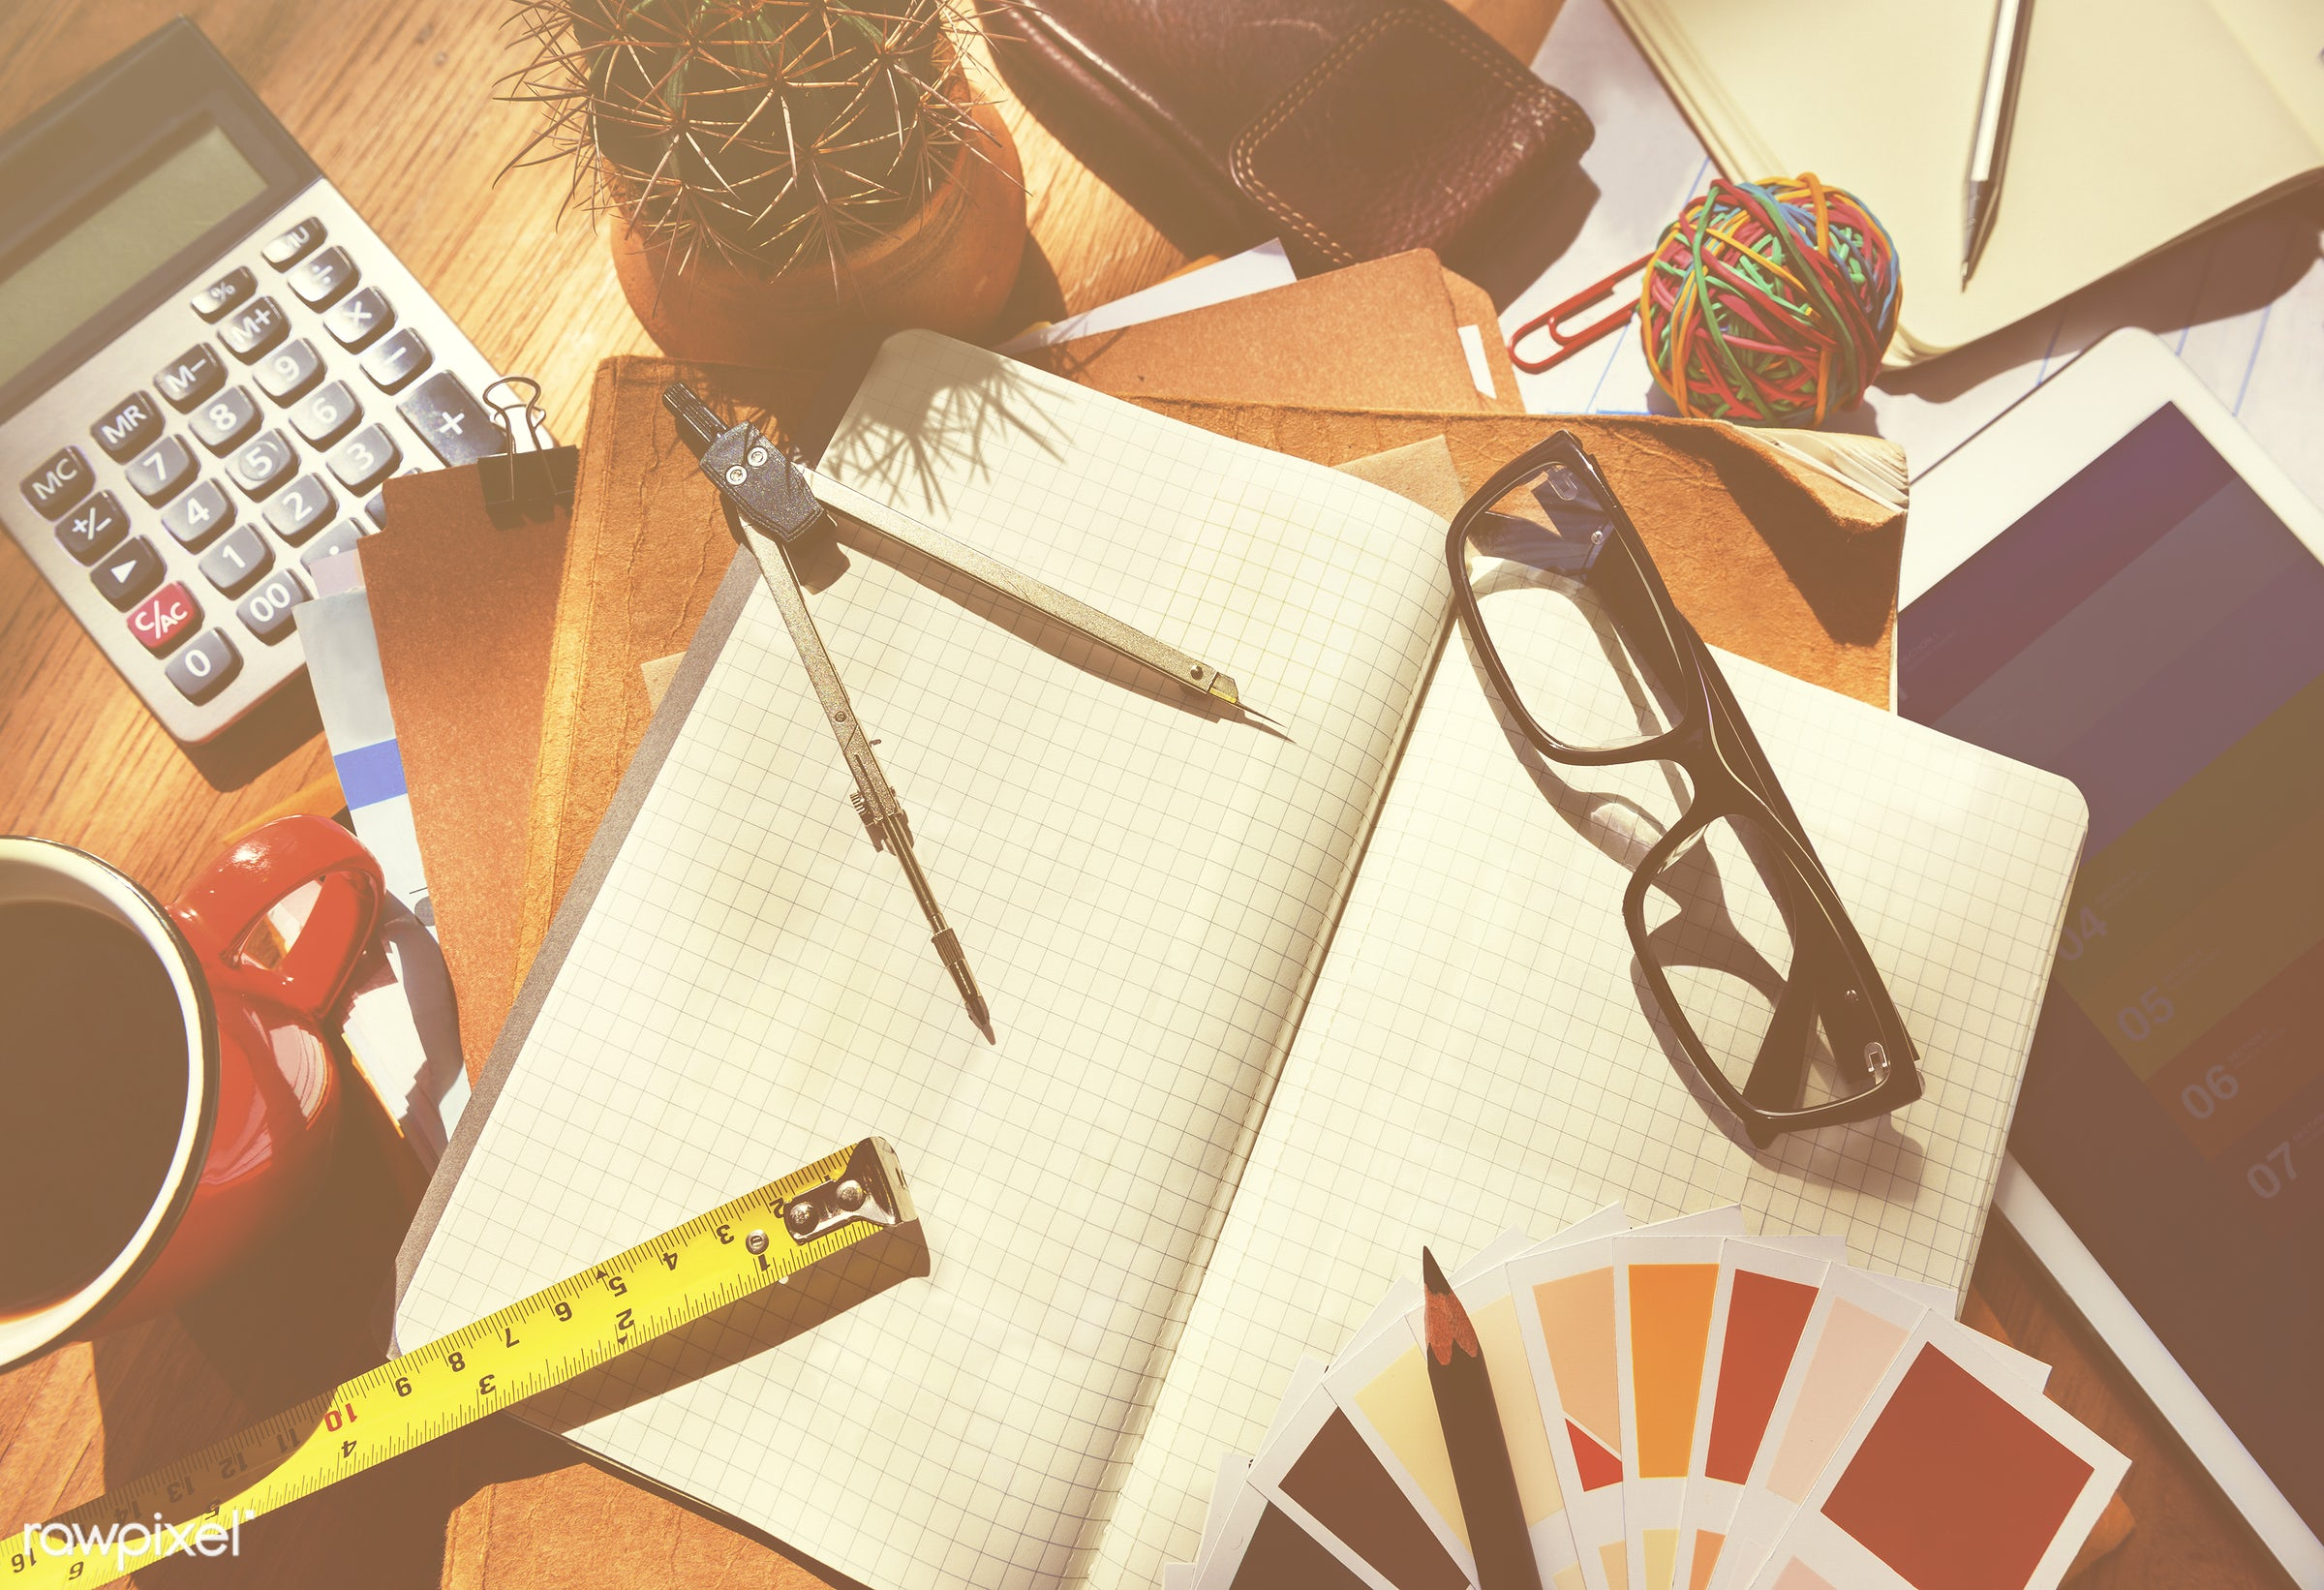 contemporary, architect, architecture, break, business, calculator, chaos, coffee, compass, concepts, copy space, creativity...